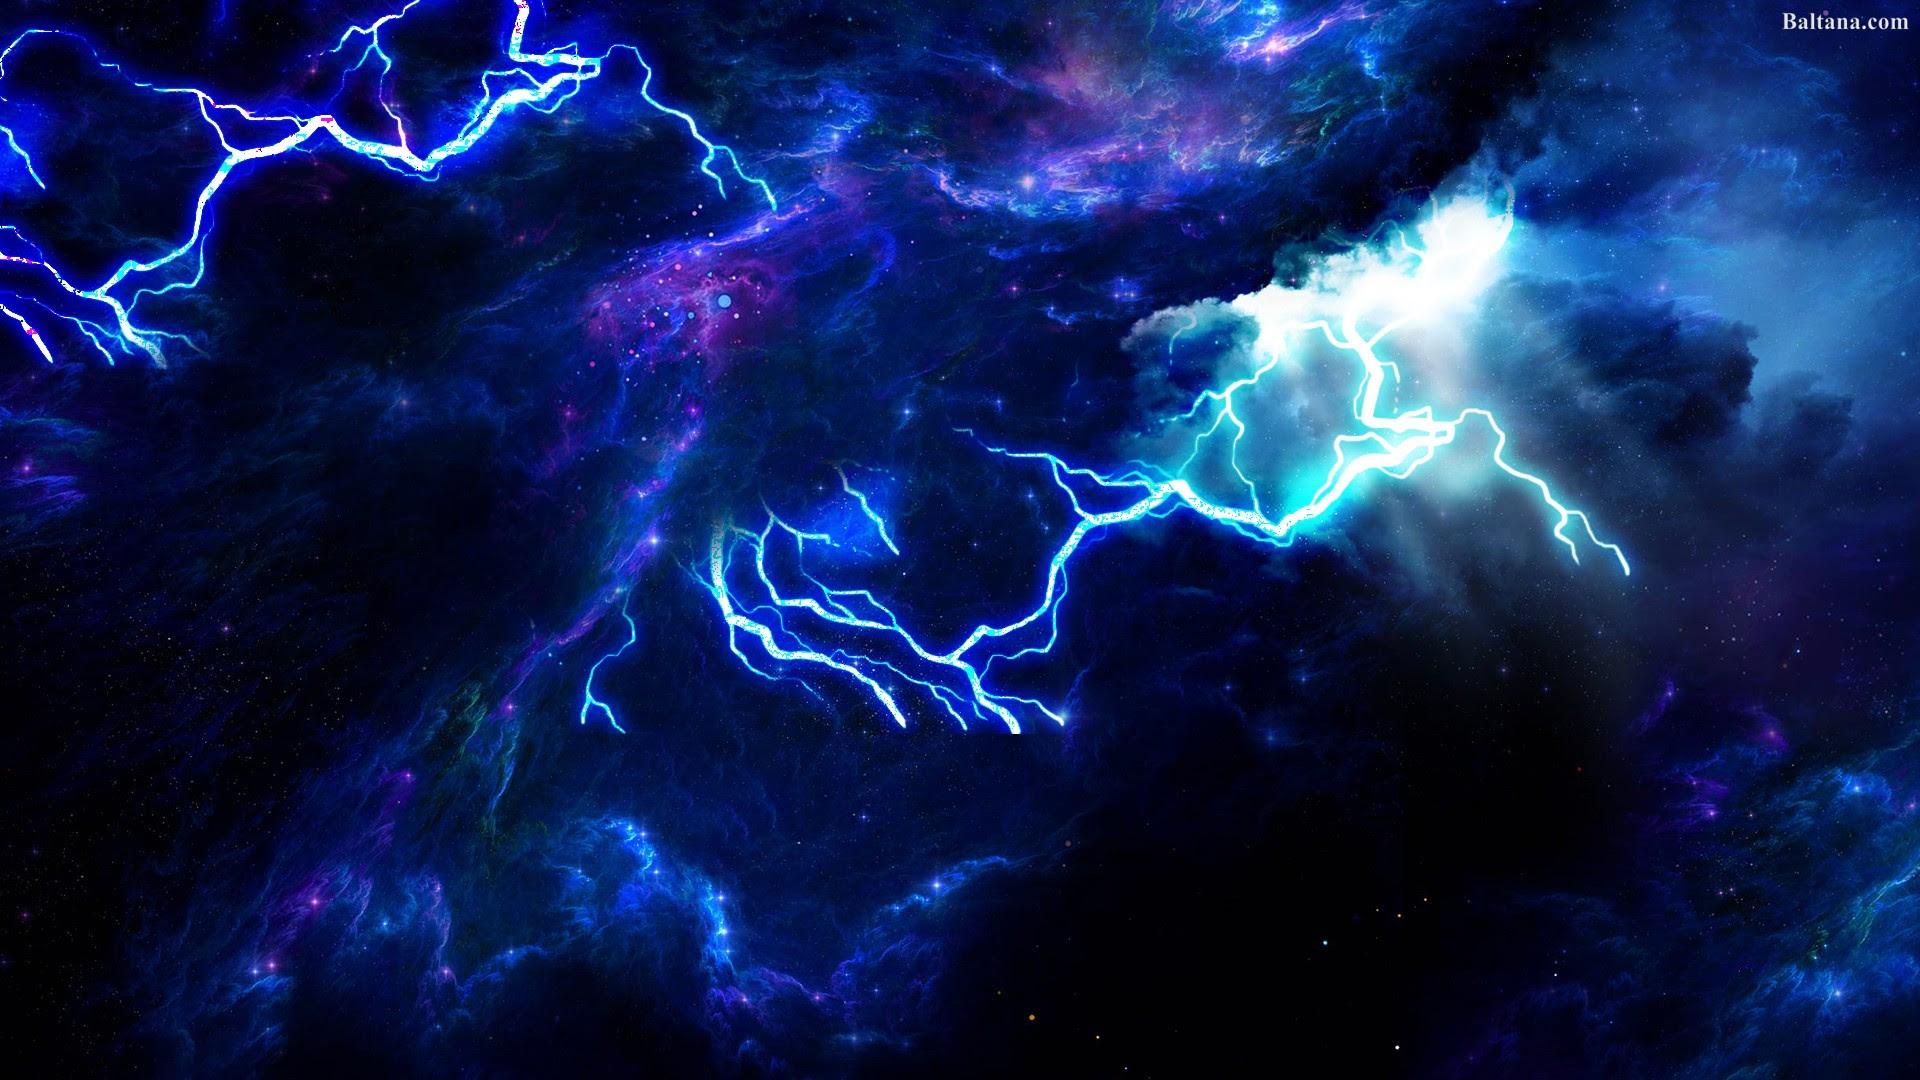 Cool Lightning Backgrounds (73+ images)